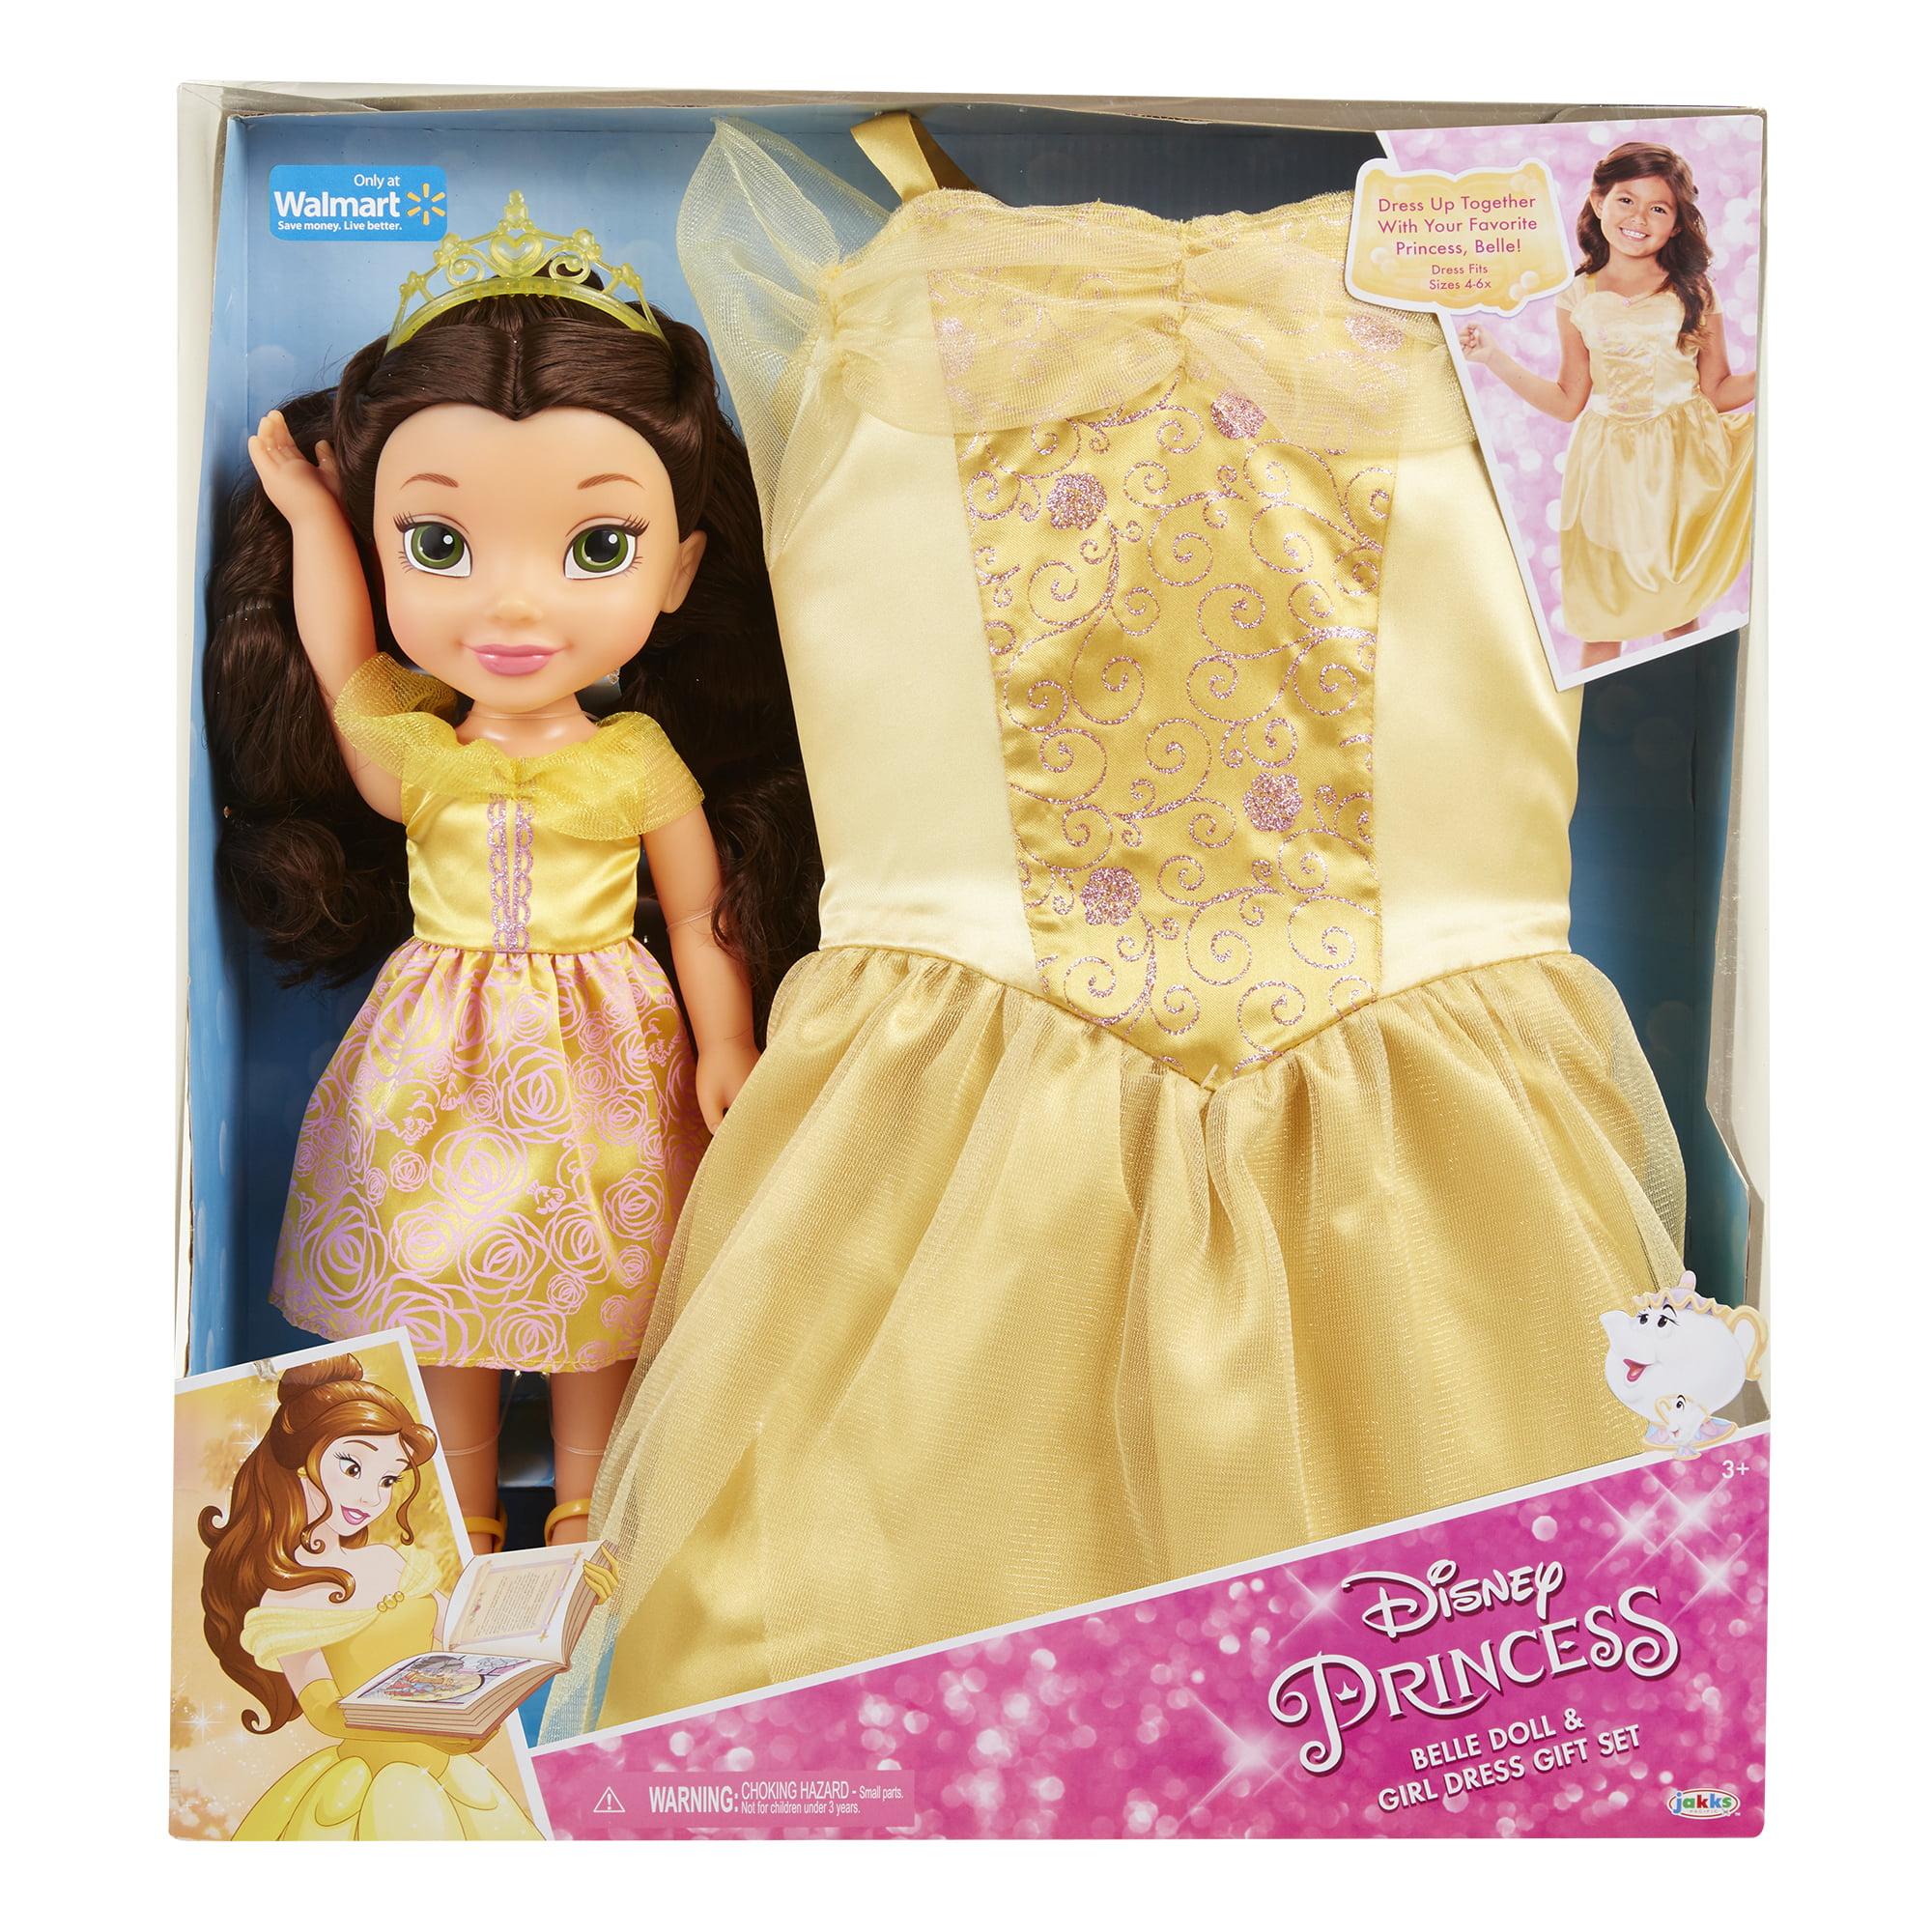 559cf95abbfb4 Disney Princess Belle Toddler Doll and Dress - Walmart.com